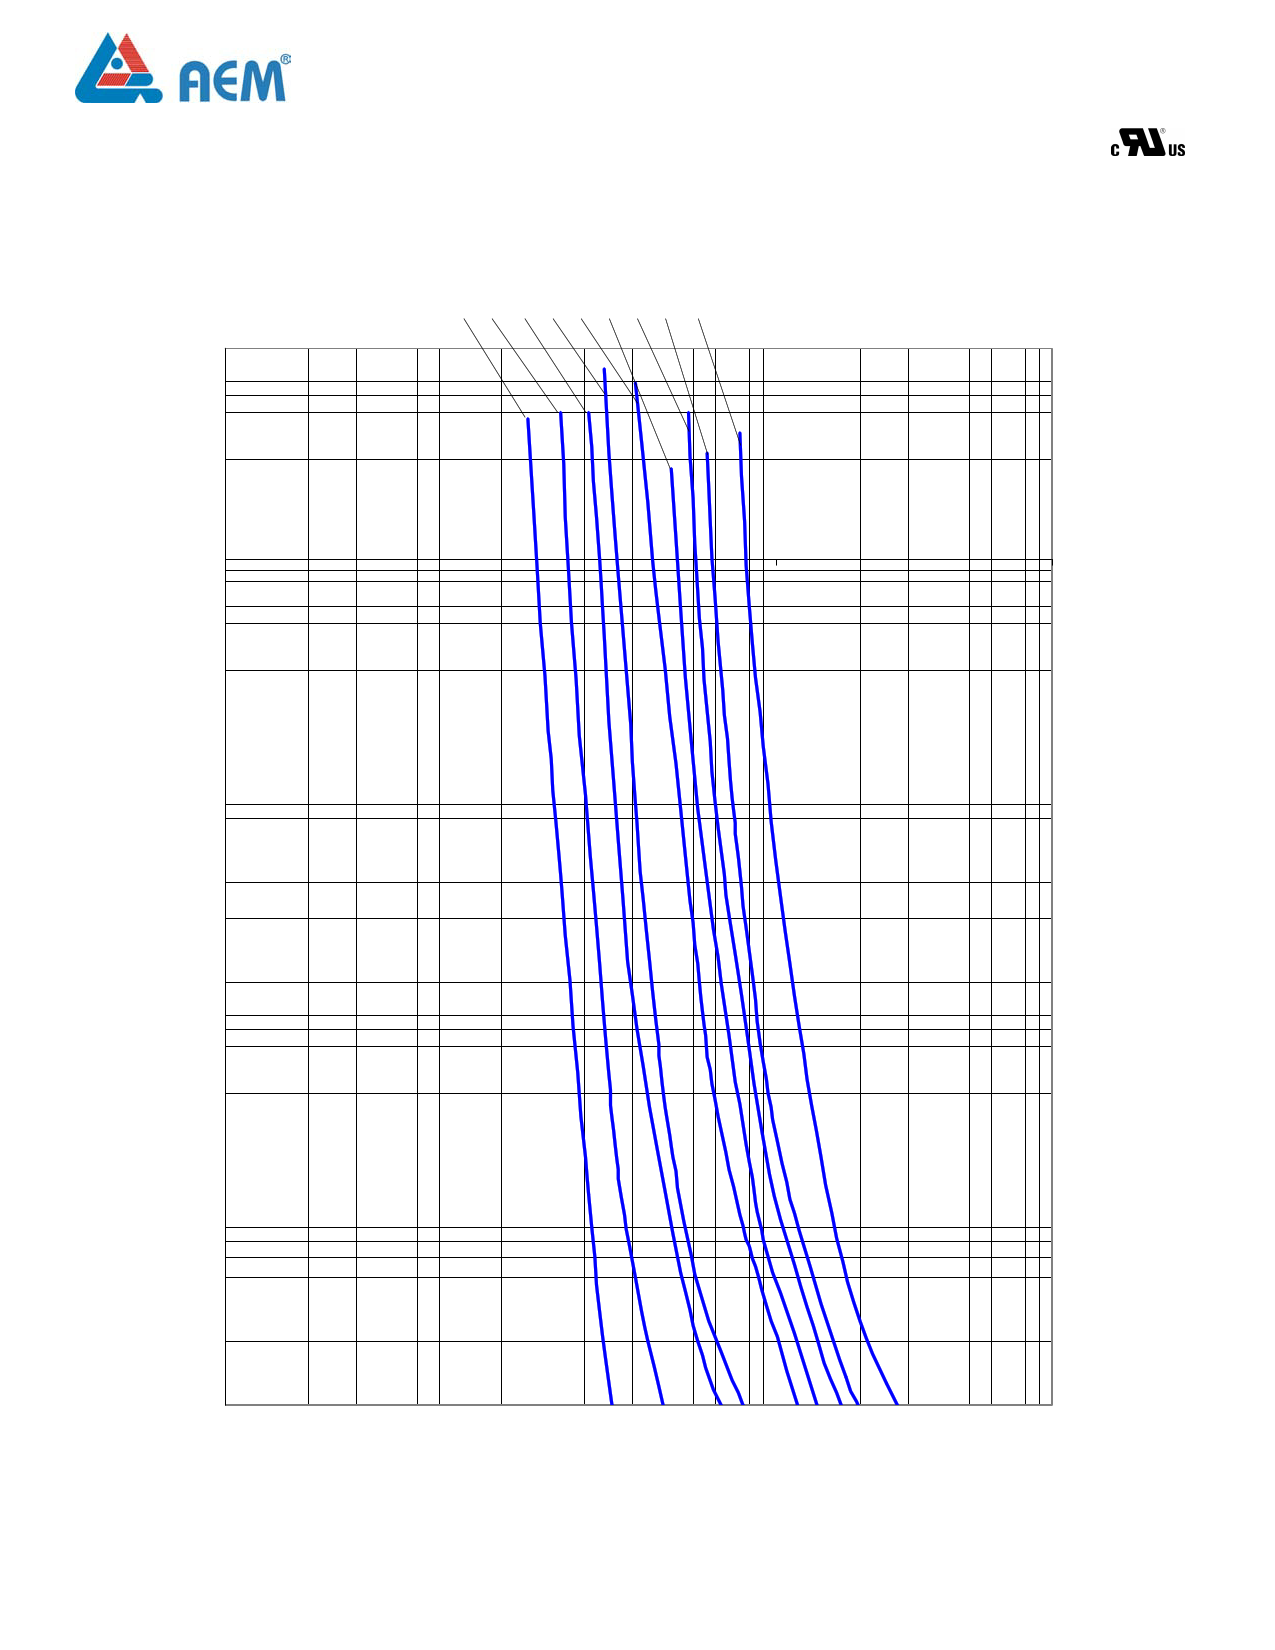 F0603FF0750V032T arduino